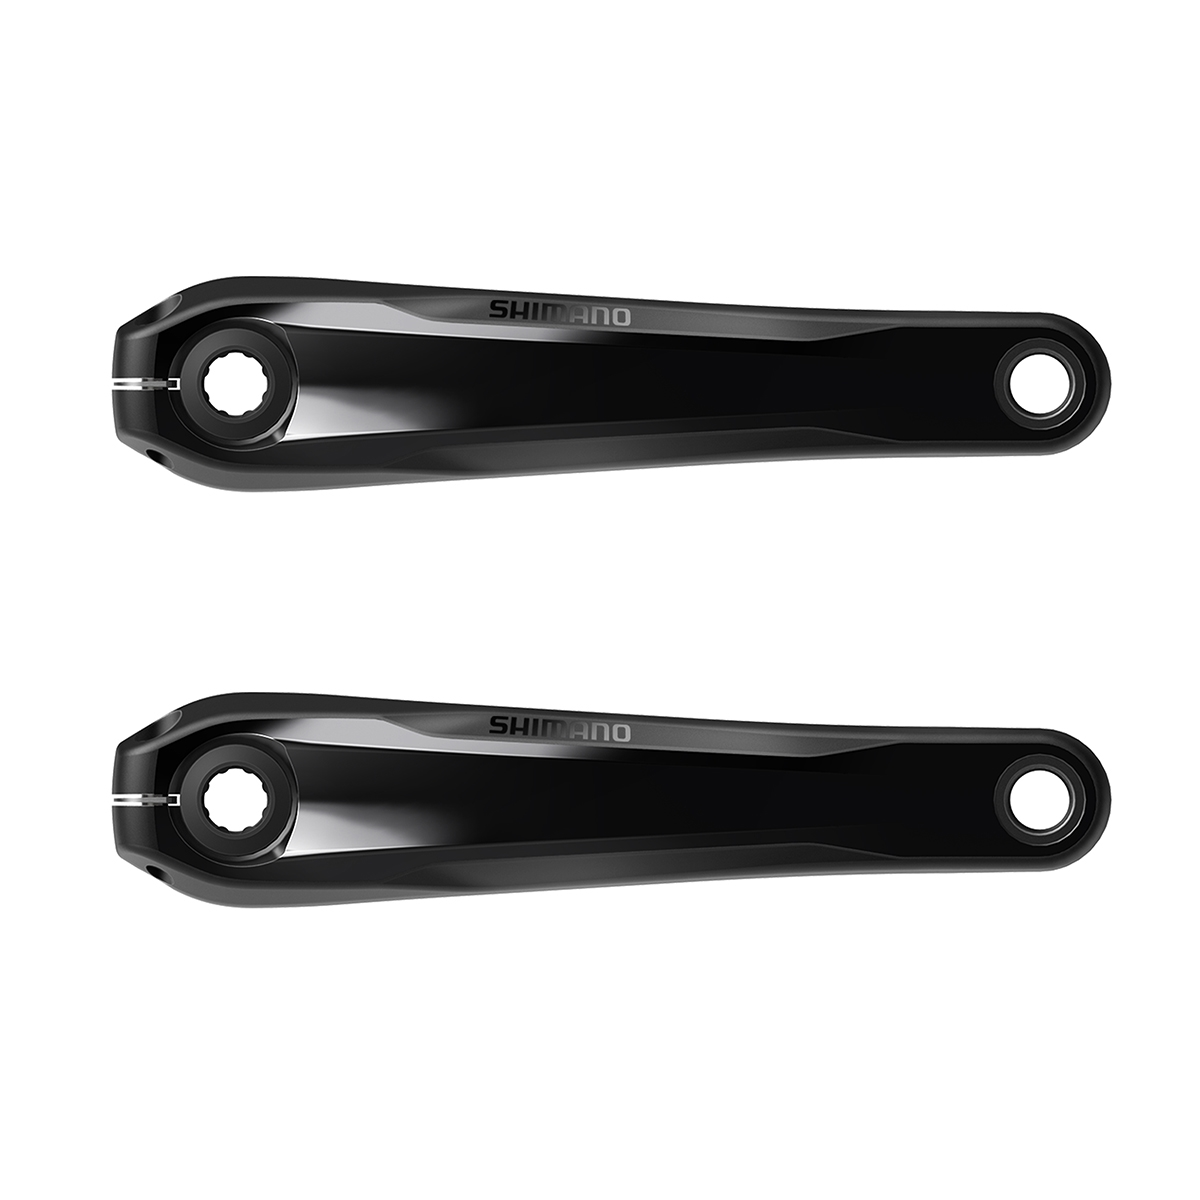 Crank Arms Pair for EP8 Motor STEPS FC-EM900 Hollowtech II 175mm